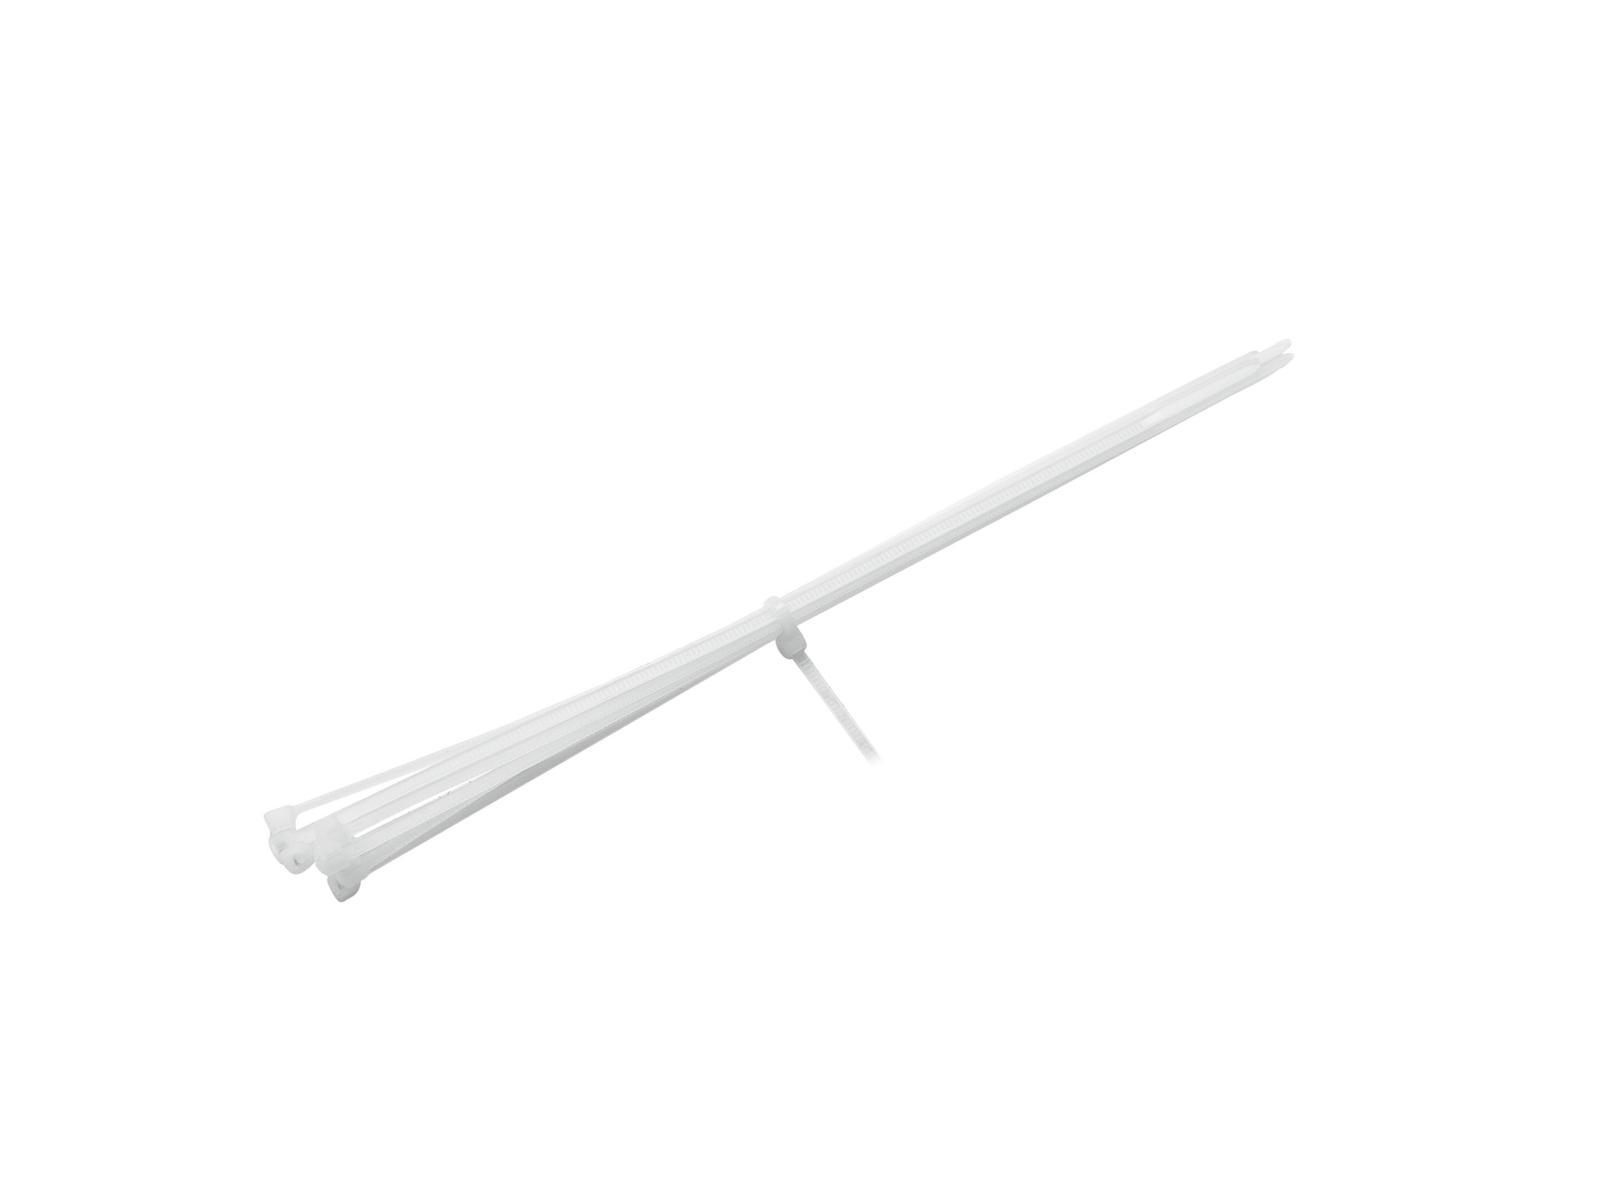 EUROLITE Cavo cravatta 300x2.9mm bianco 100x